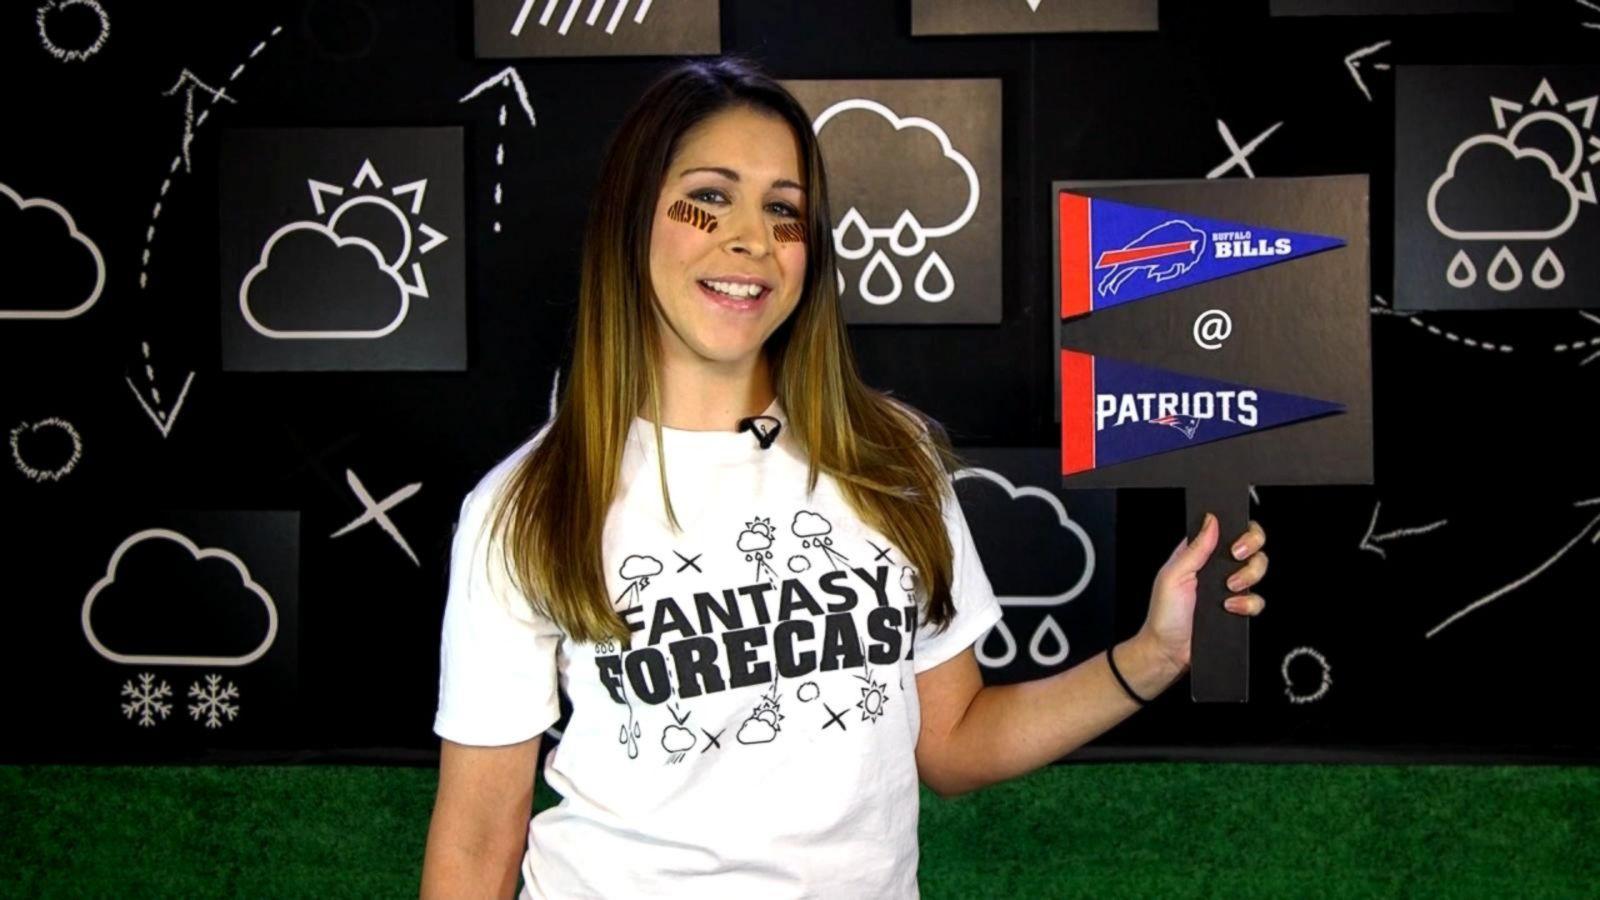 VIDEO: Fantasy Forecast: Week 4